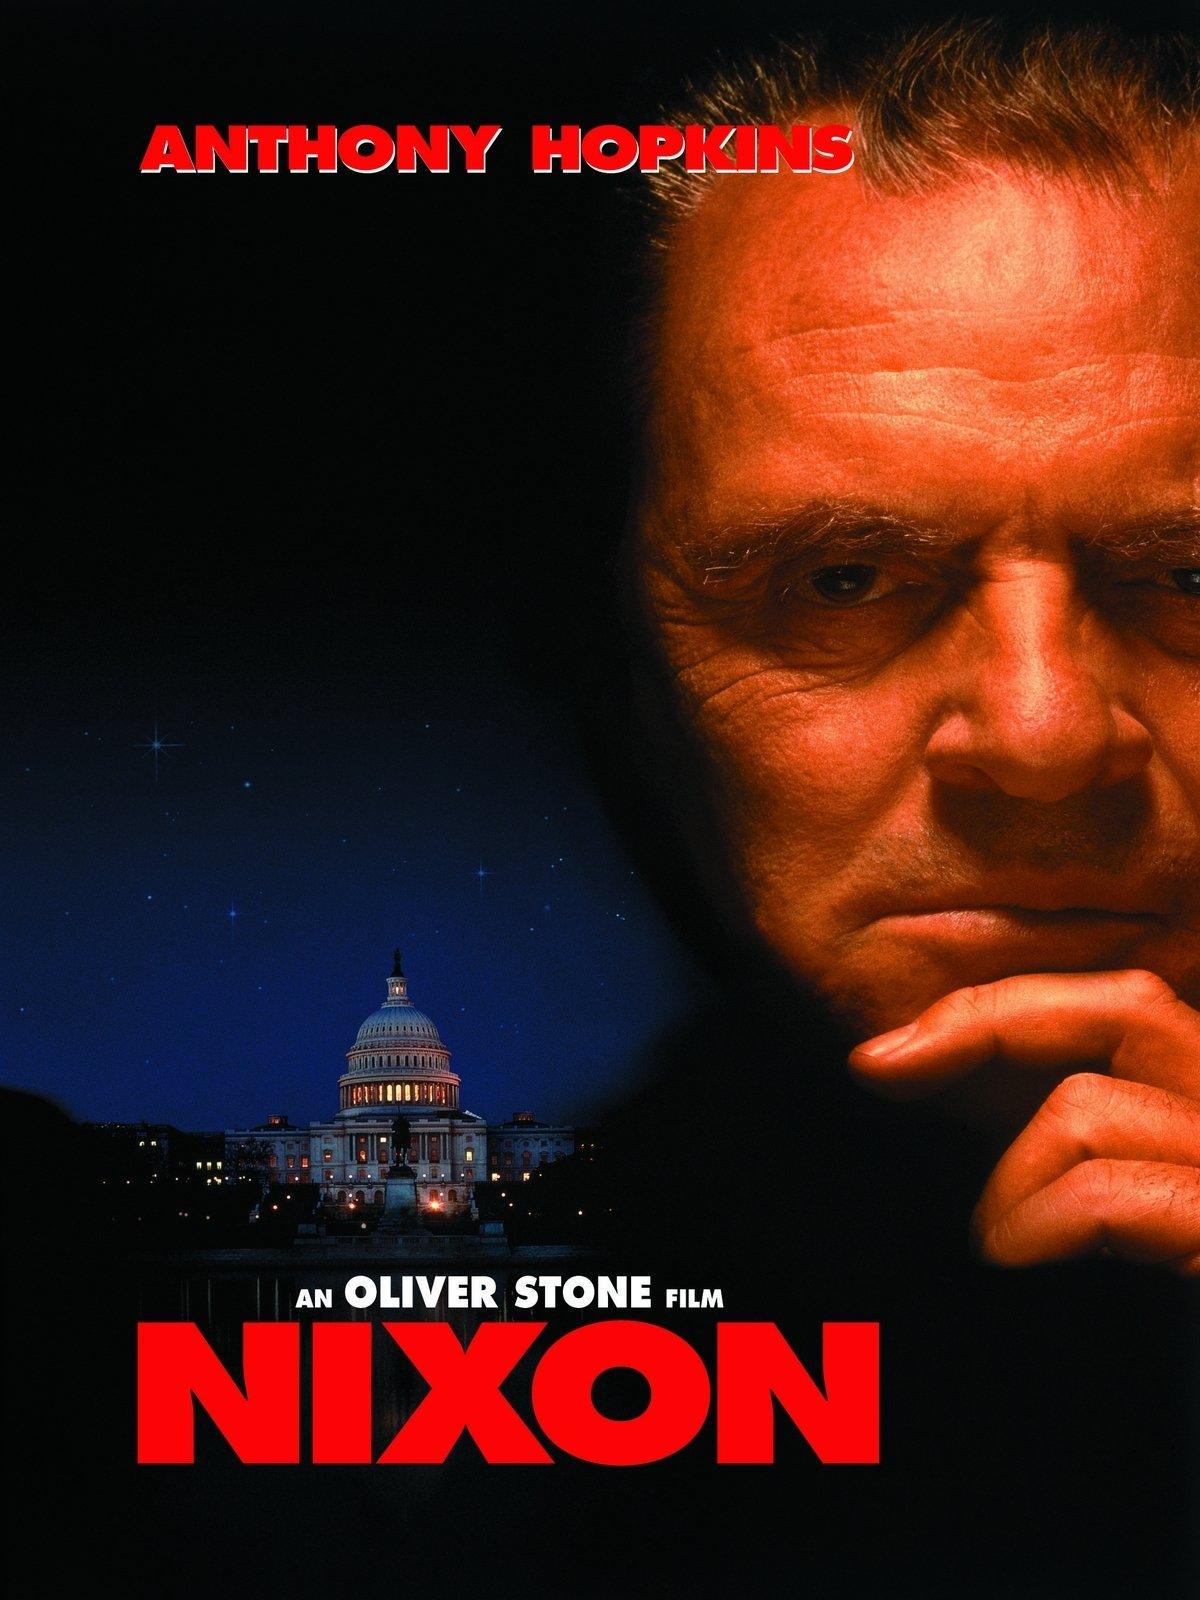 NIXON - Role | Arthur NixonDirector | Oliver Stone